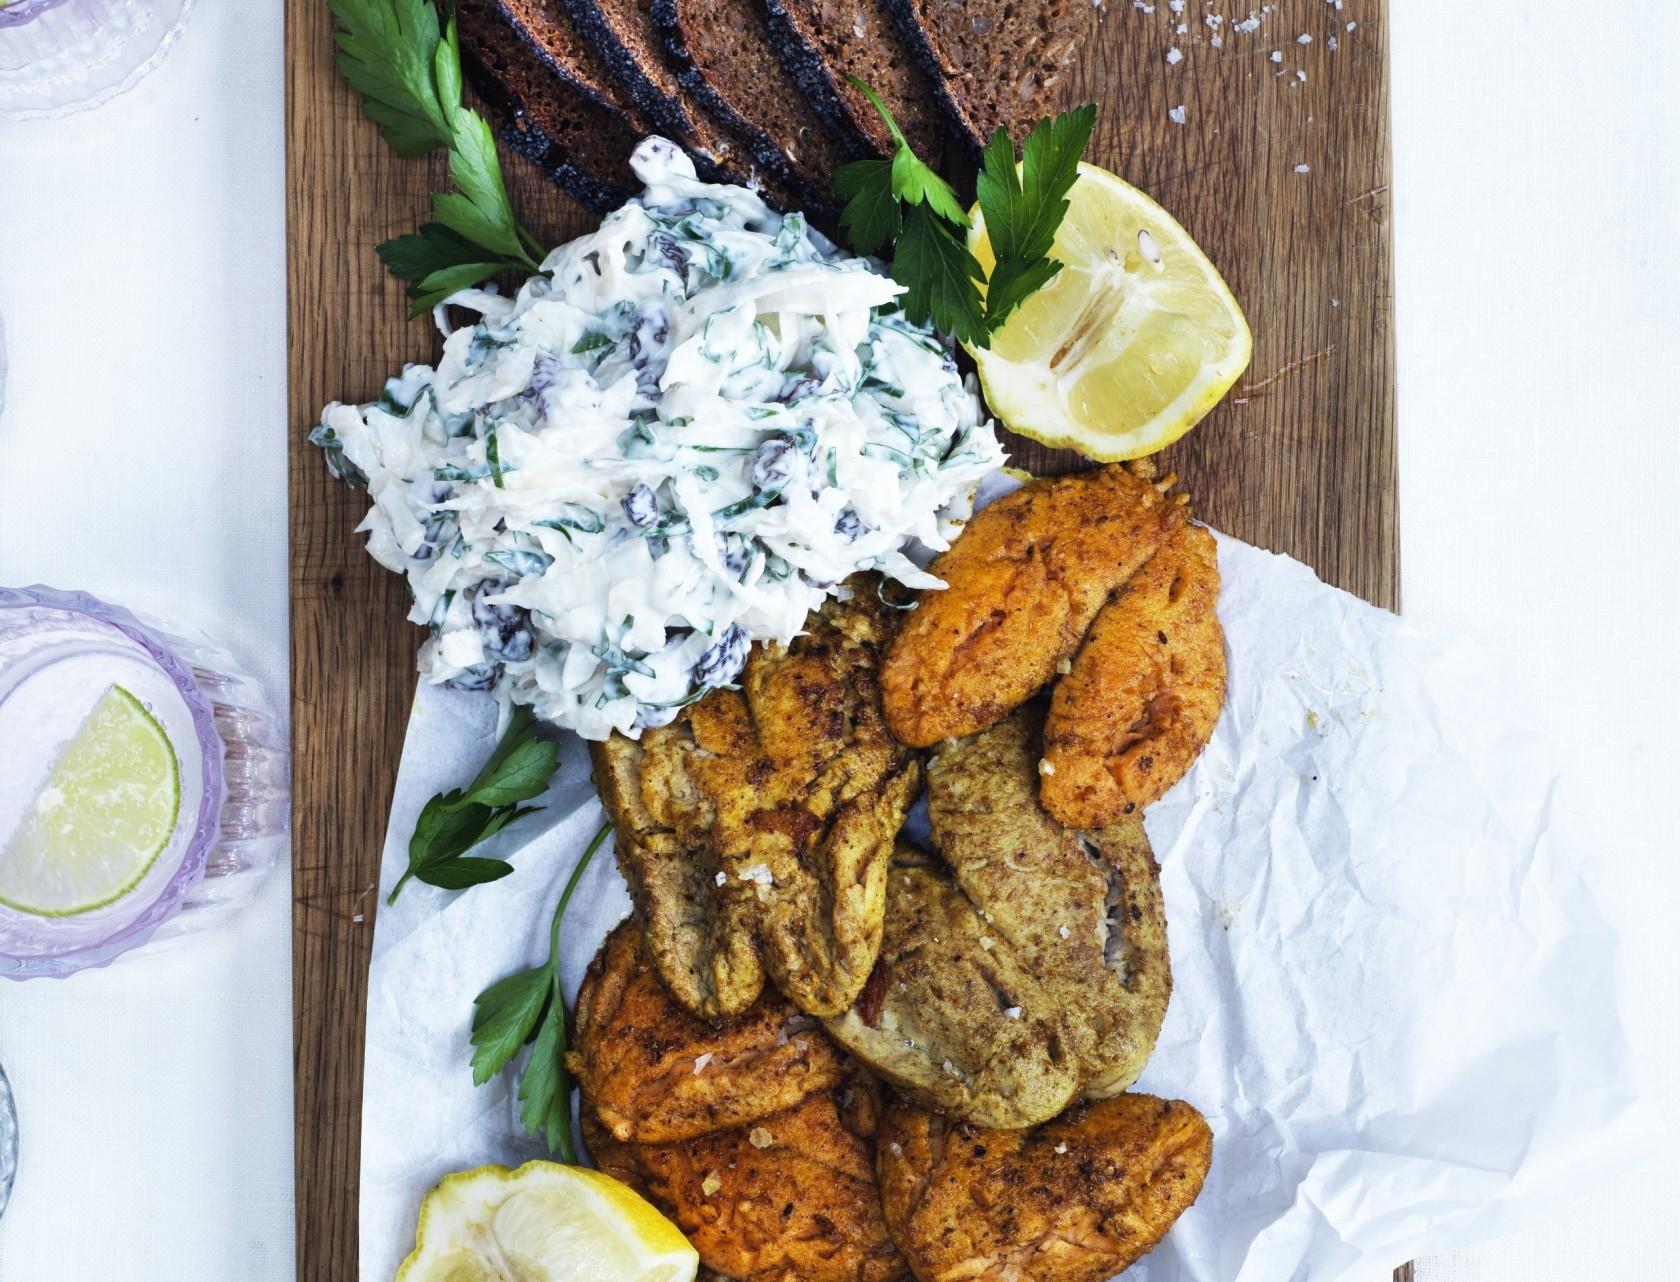 Sprødstegt torskerogn med sellerislaw – en herlig frokostklassiker!